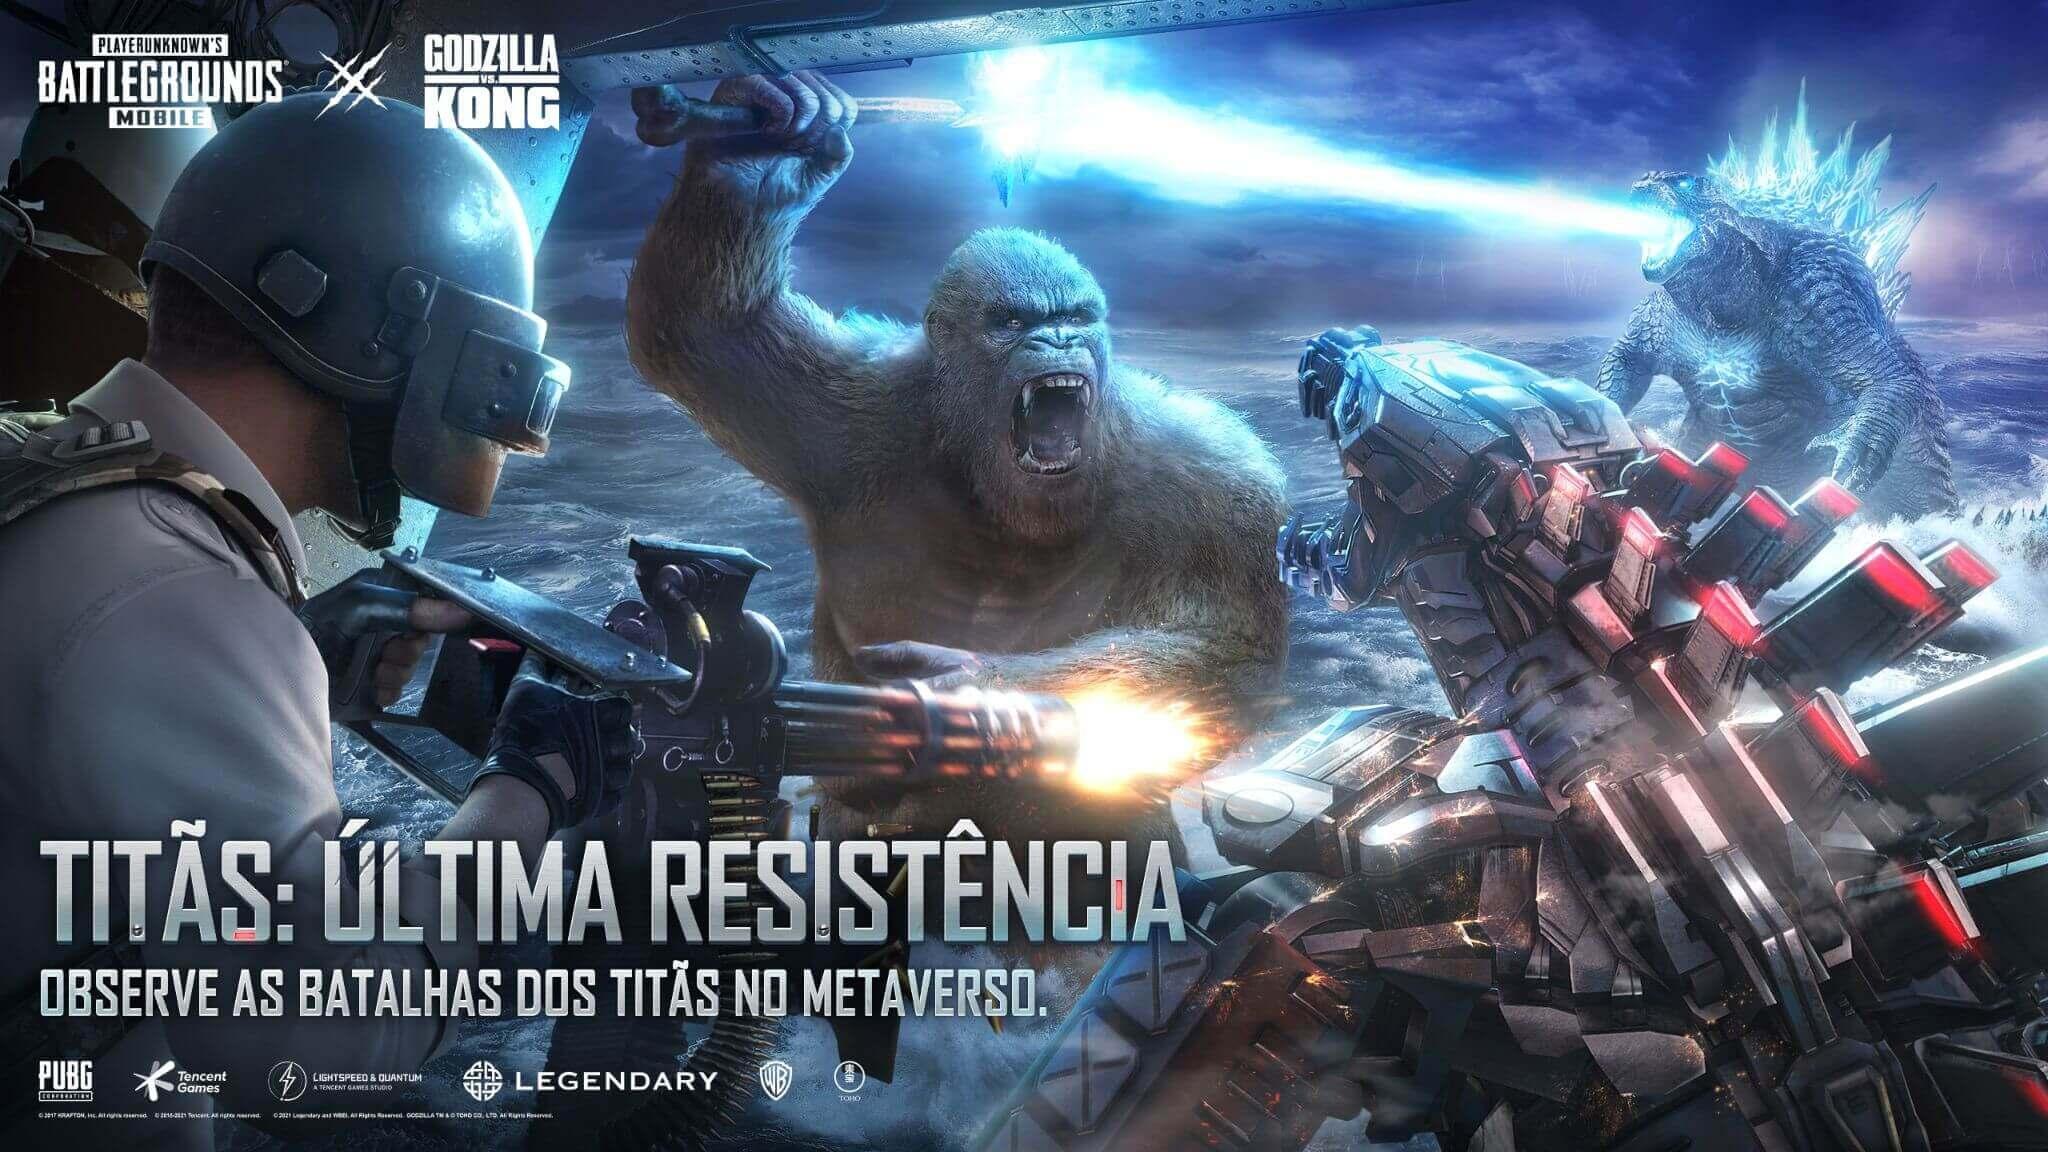 PUBG Mobile: Disponível novo capítulo de Godzilla vs. Kong